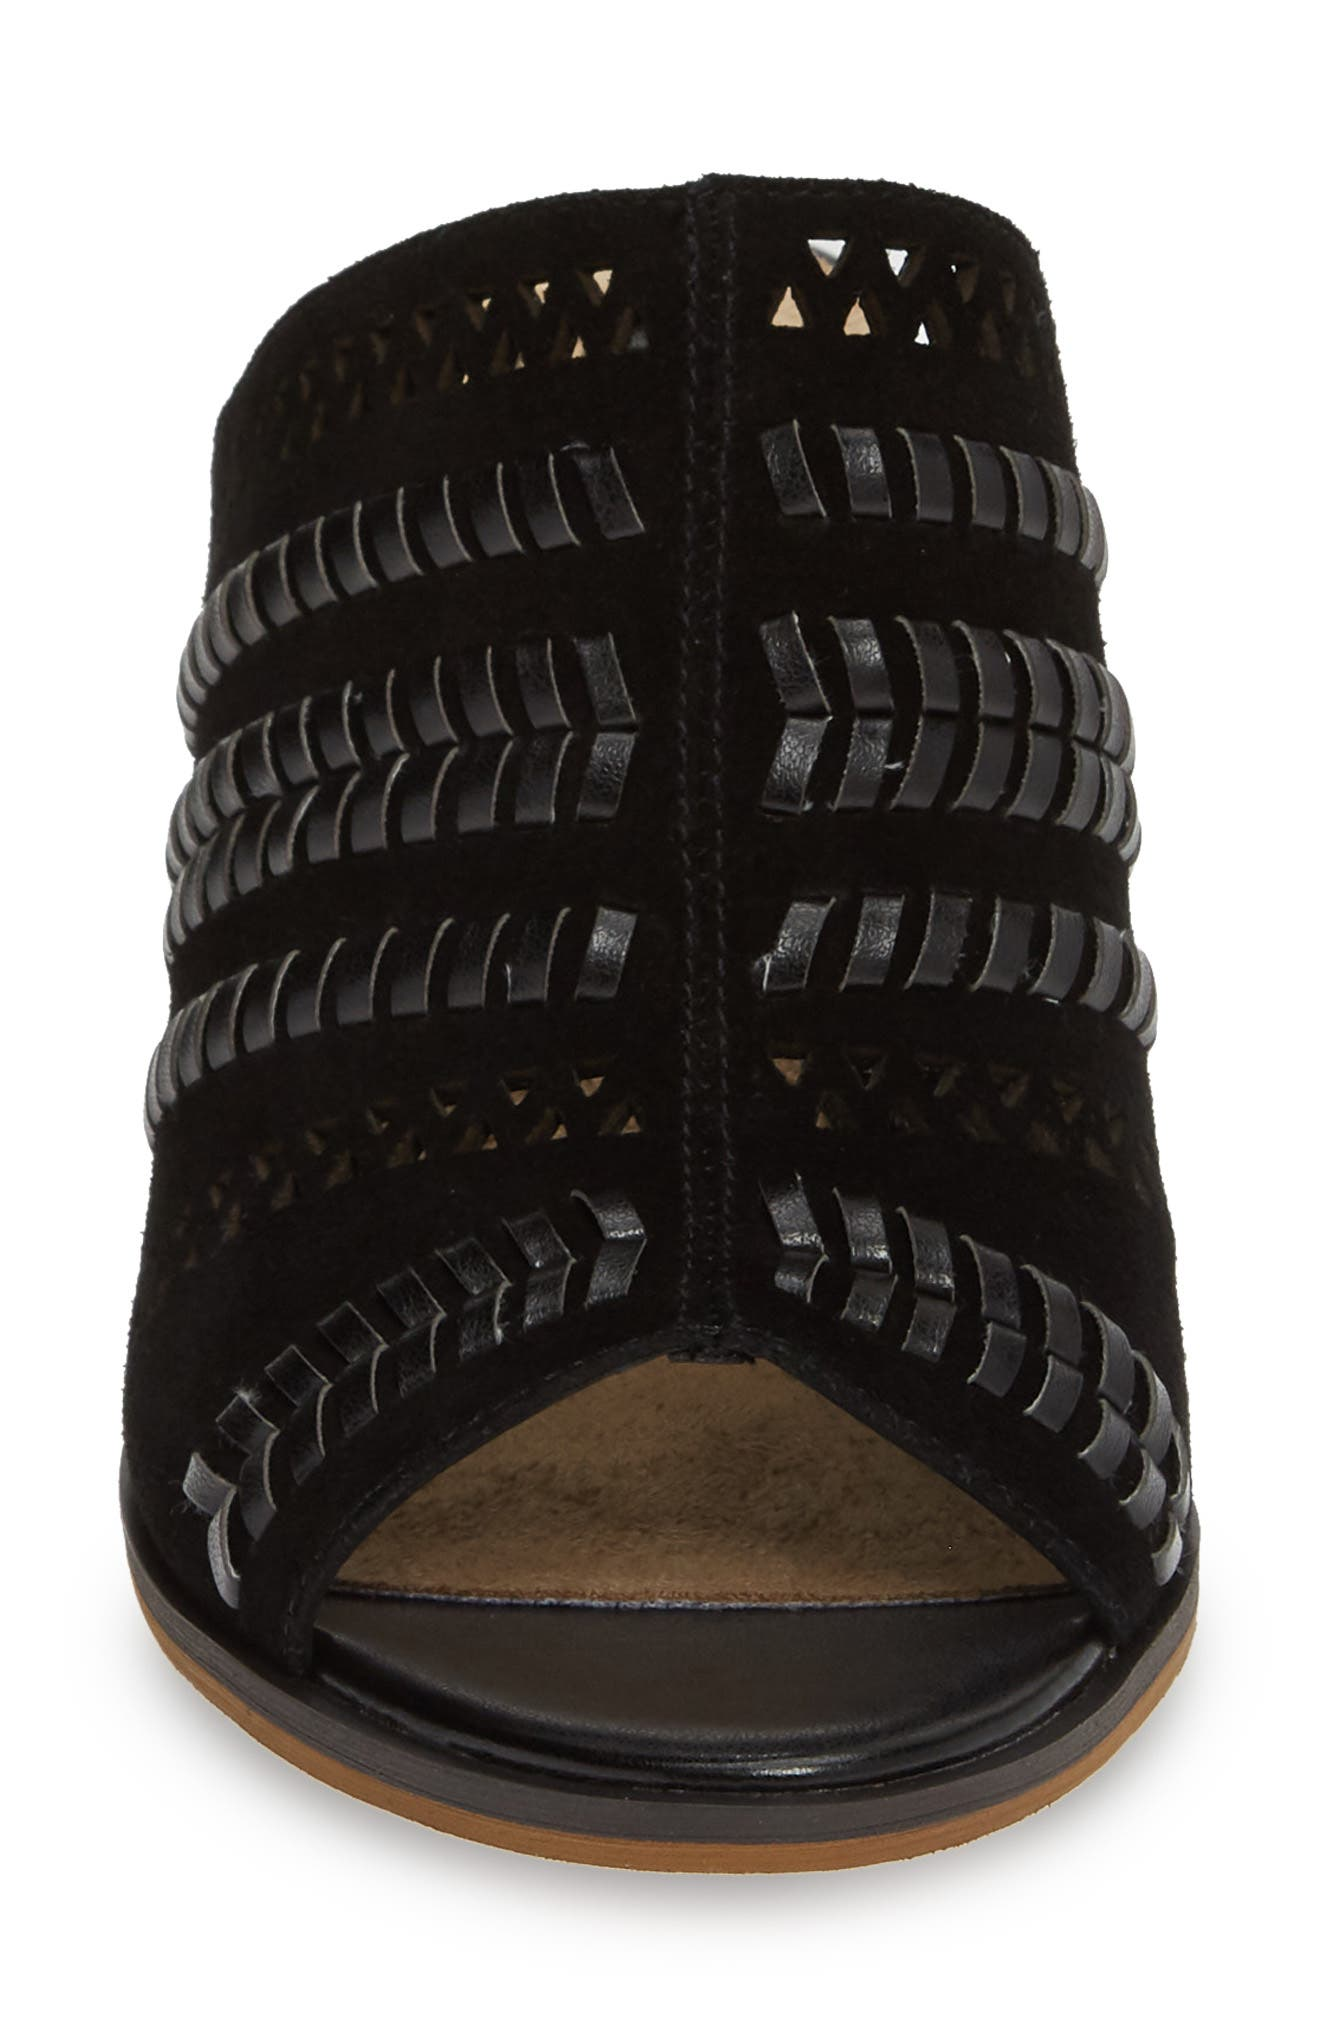 BELLA VITA, Koraline Open Toe Mule, Alternate thumbnail 4, color, BLACK SUEDE LEATHER